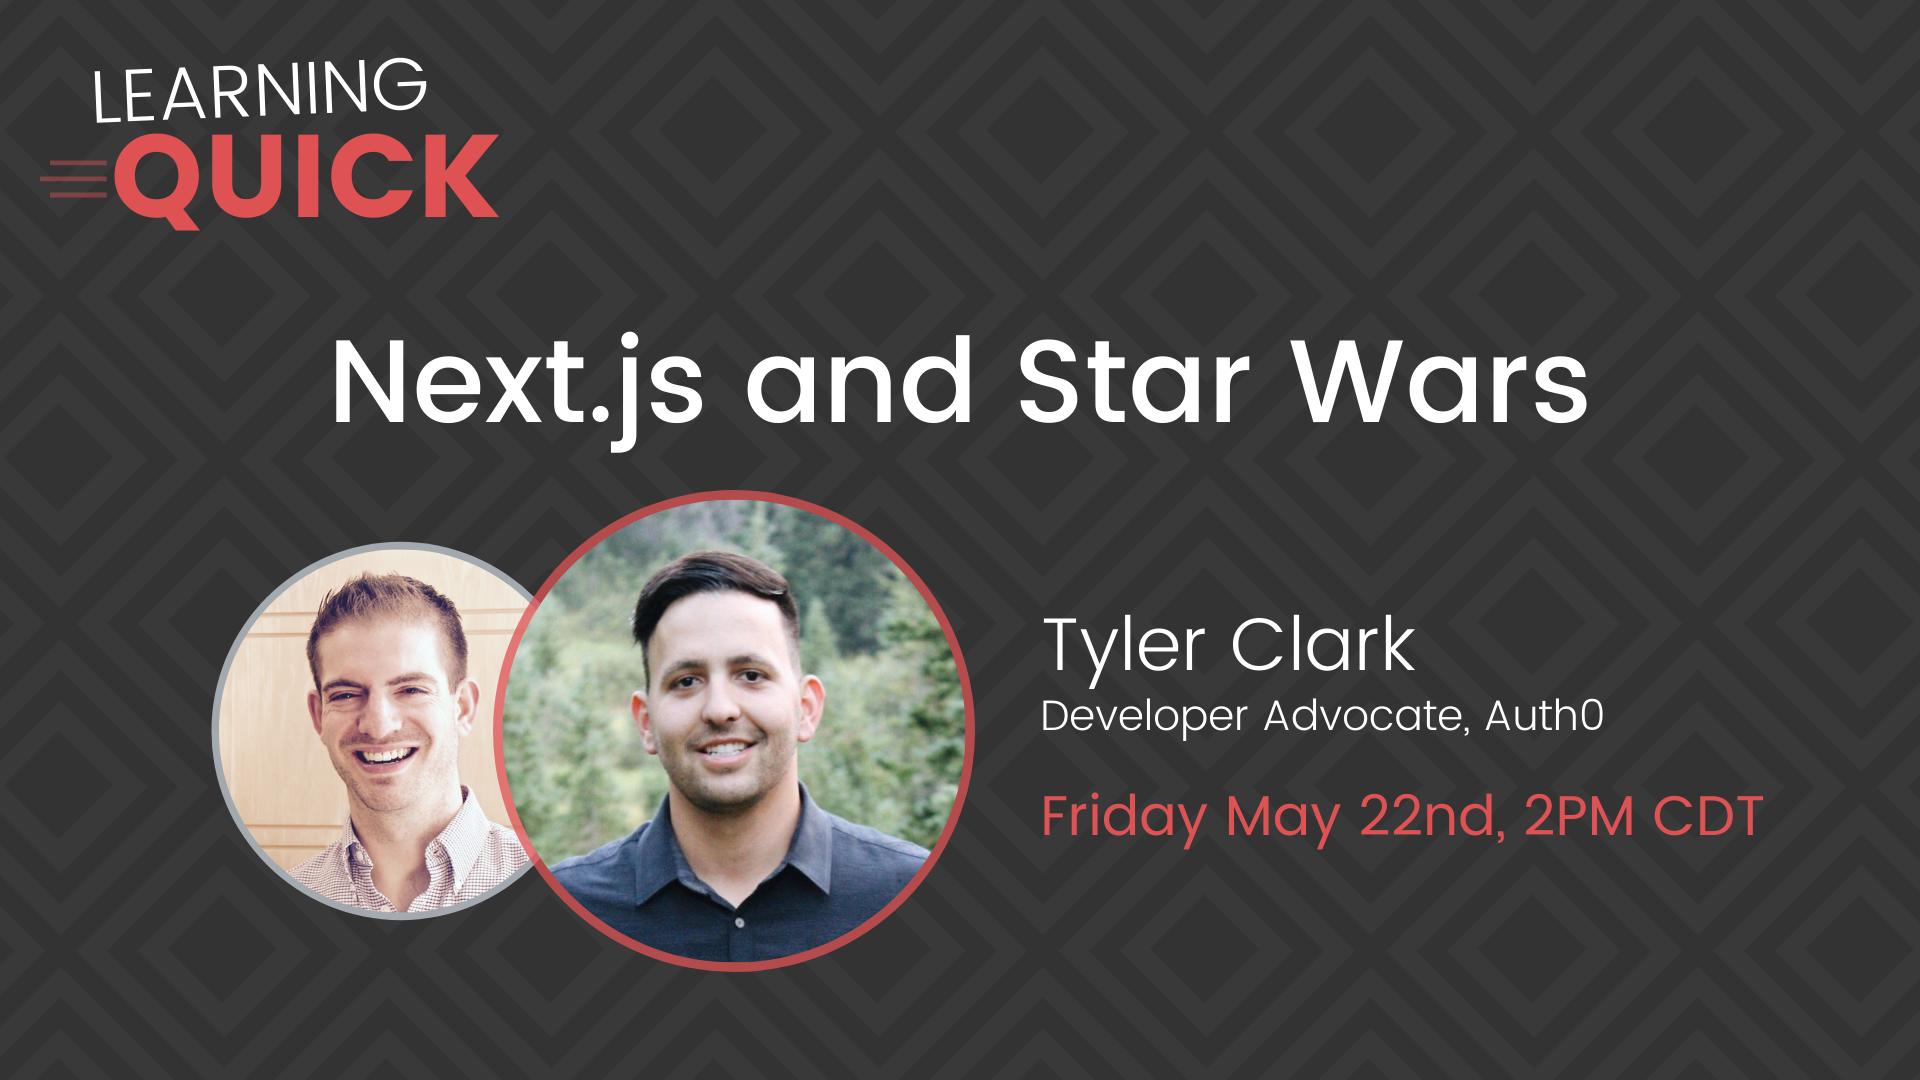 Next.js and Star Wars